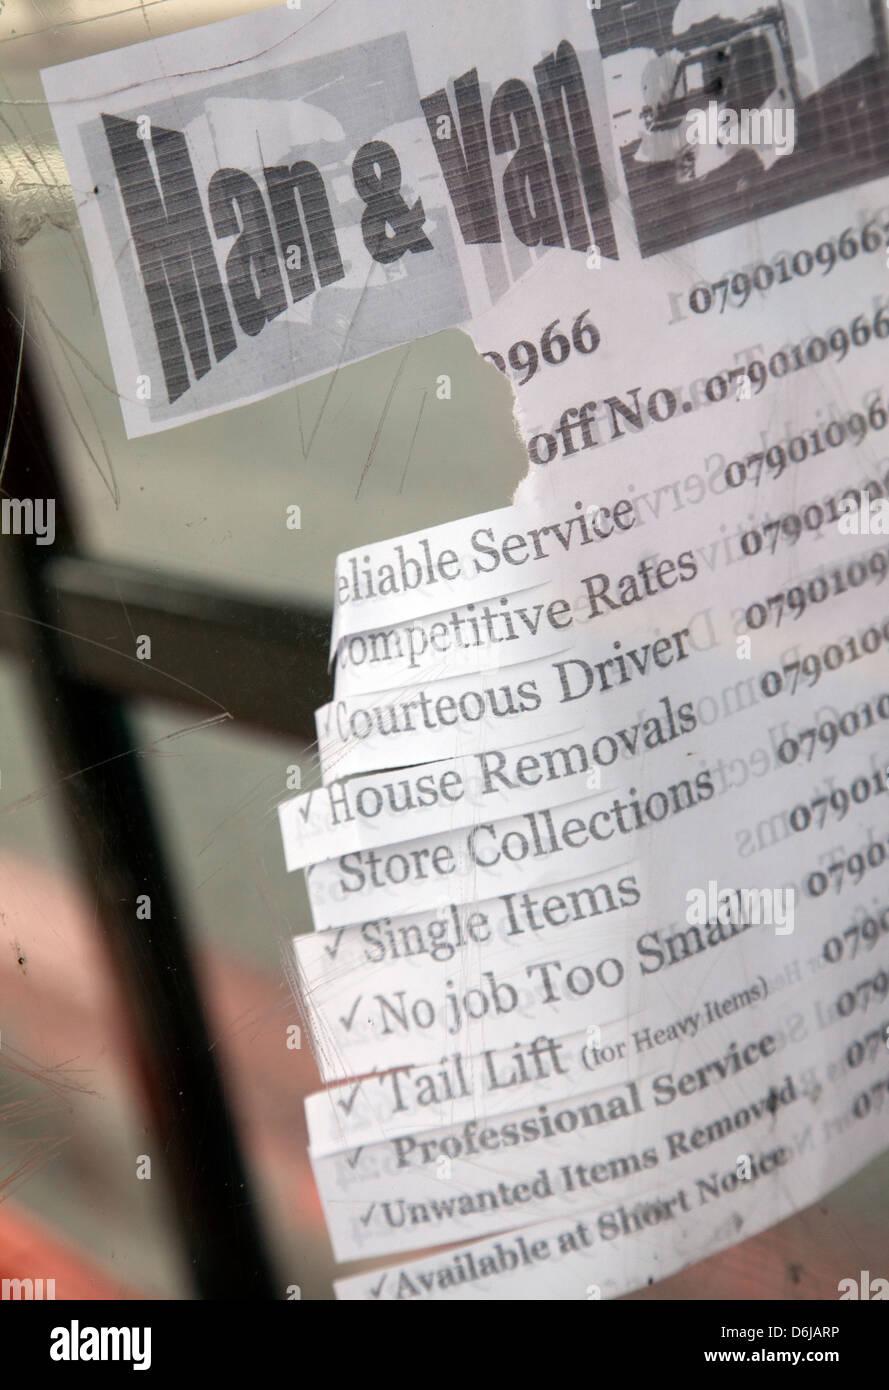 Man & Van Paper strips to tear off - Offering Service in London UK - Stock Image